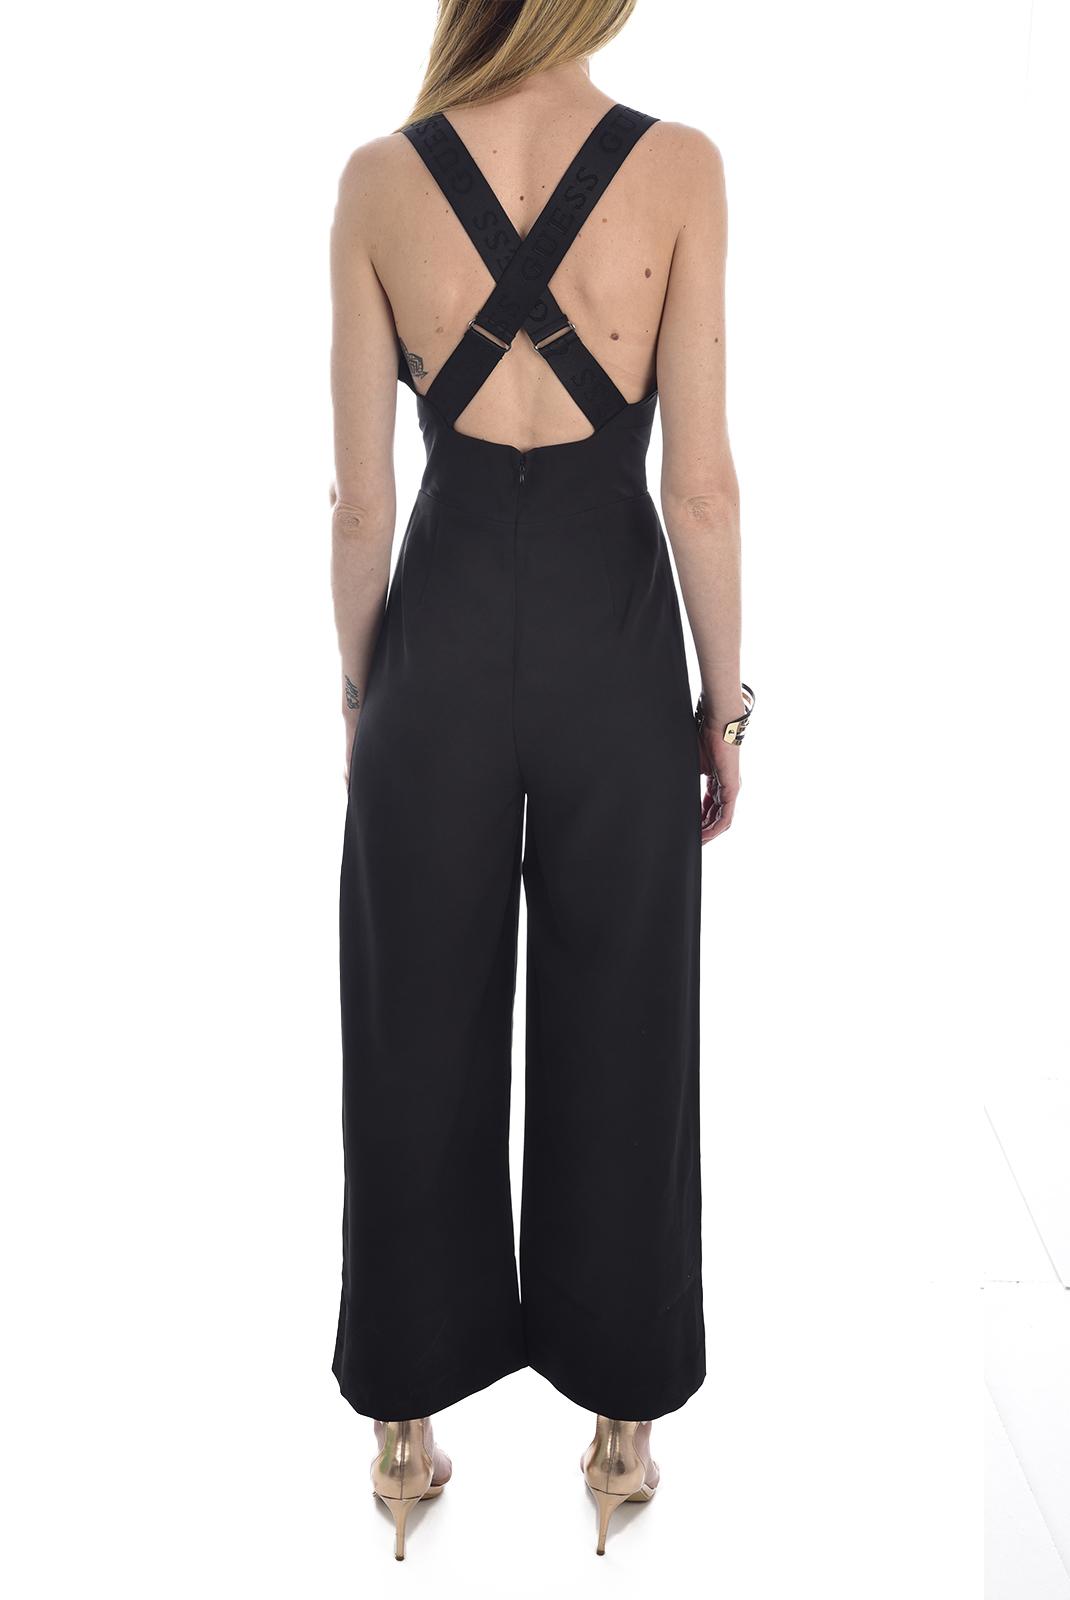 Combinaisons & Salopettes  Guess jeans W0GK0D WB4H0 NORA JBLKJet Black A996